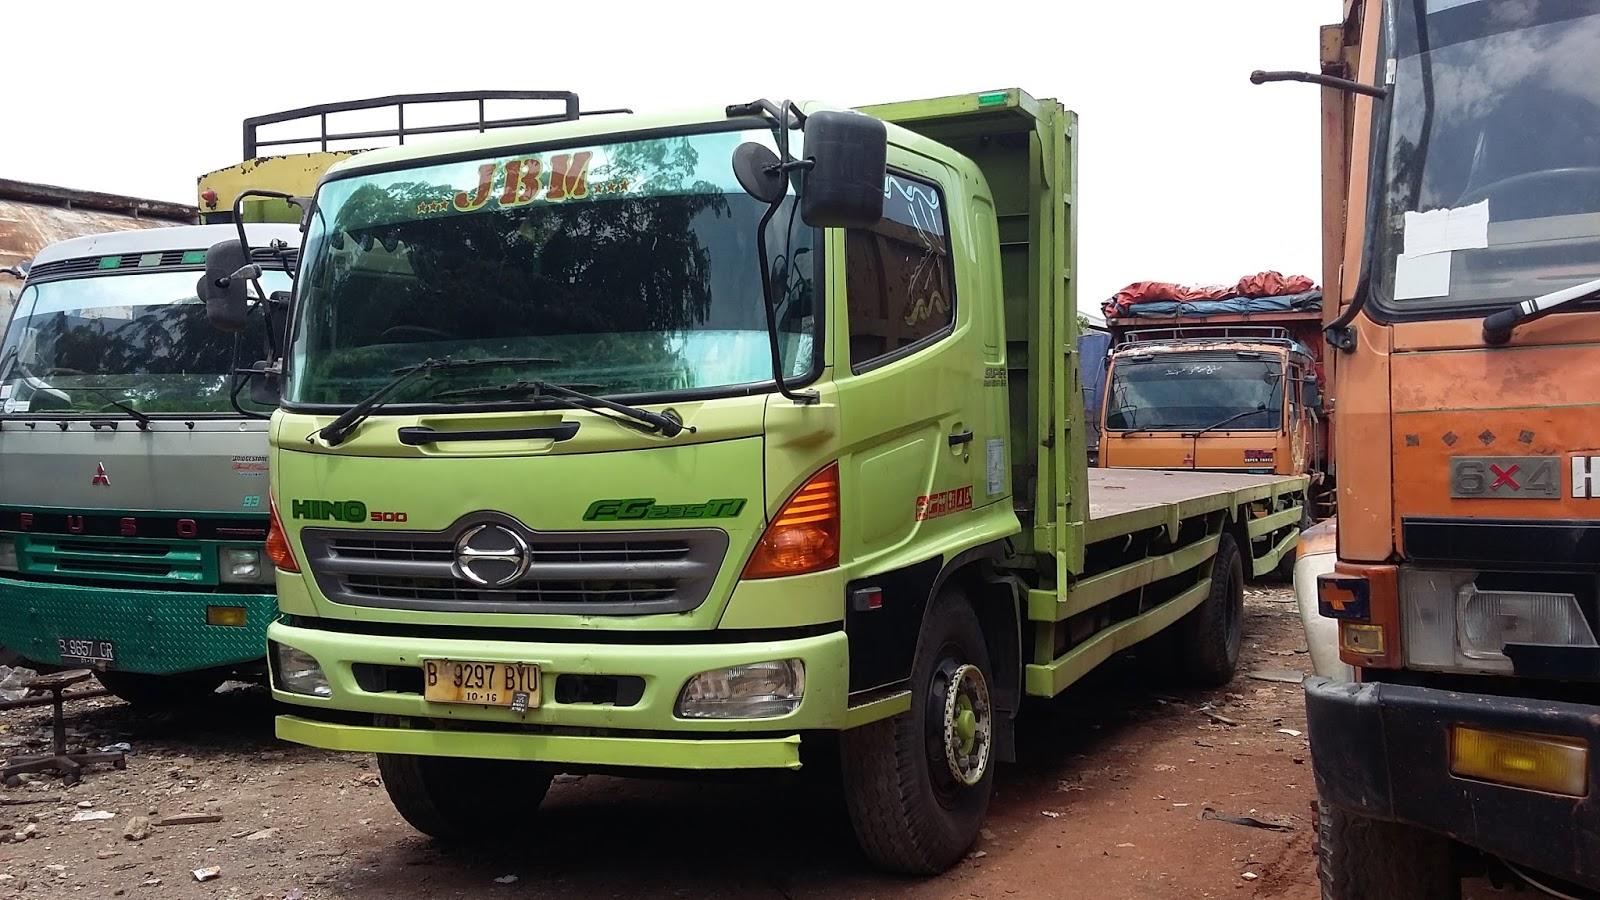 Jual Truck Bekas Hino Lohan Los Bak Thn 2011